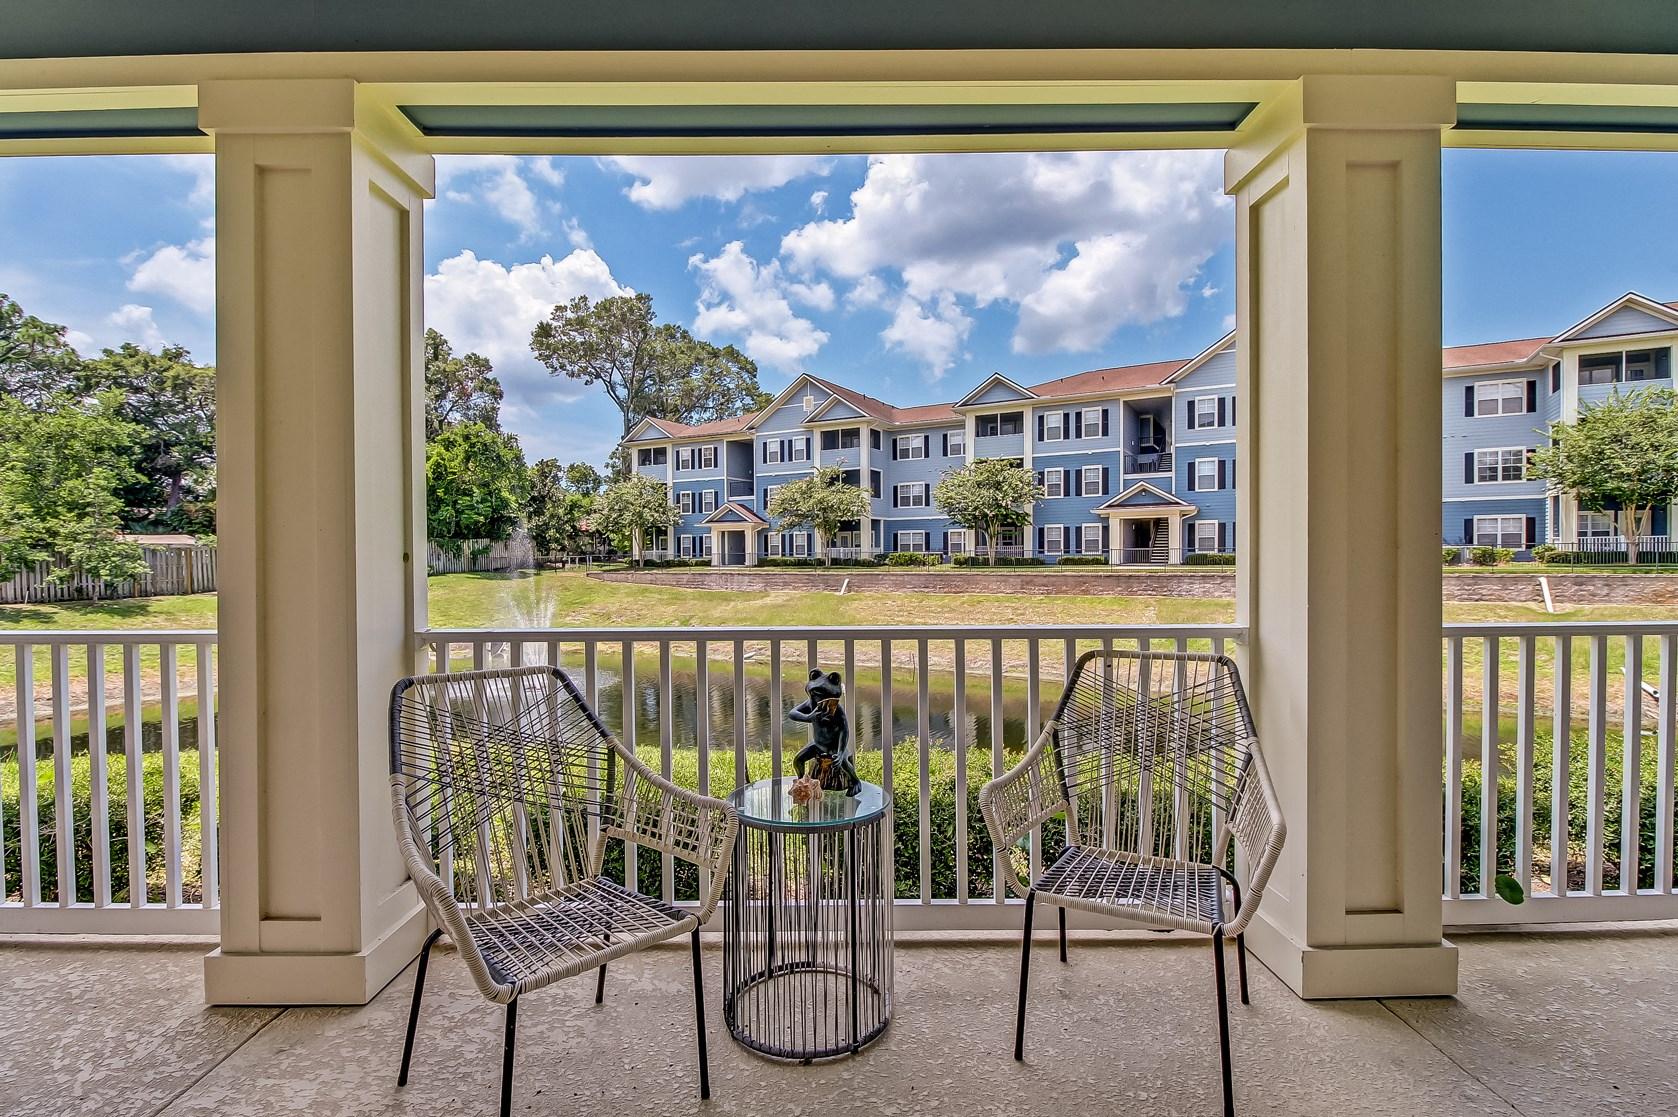 Patio at Magnolia Village Apartments in Jacksonville, FL